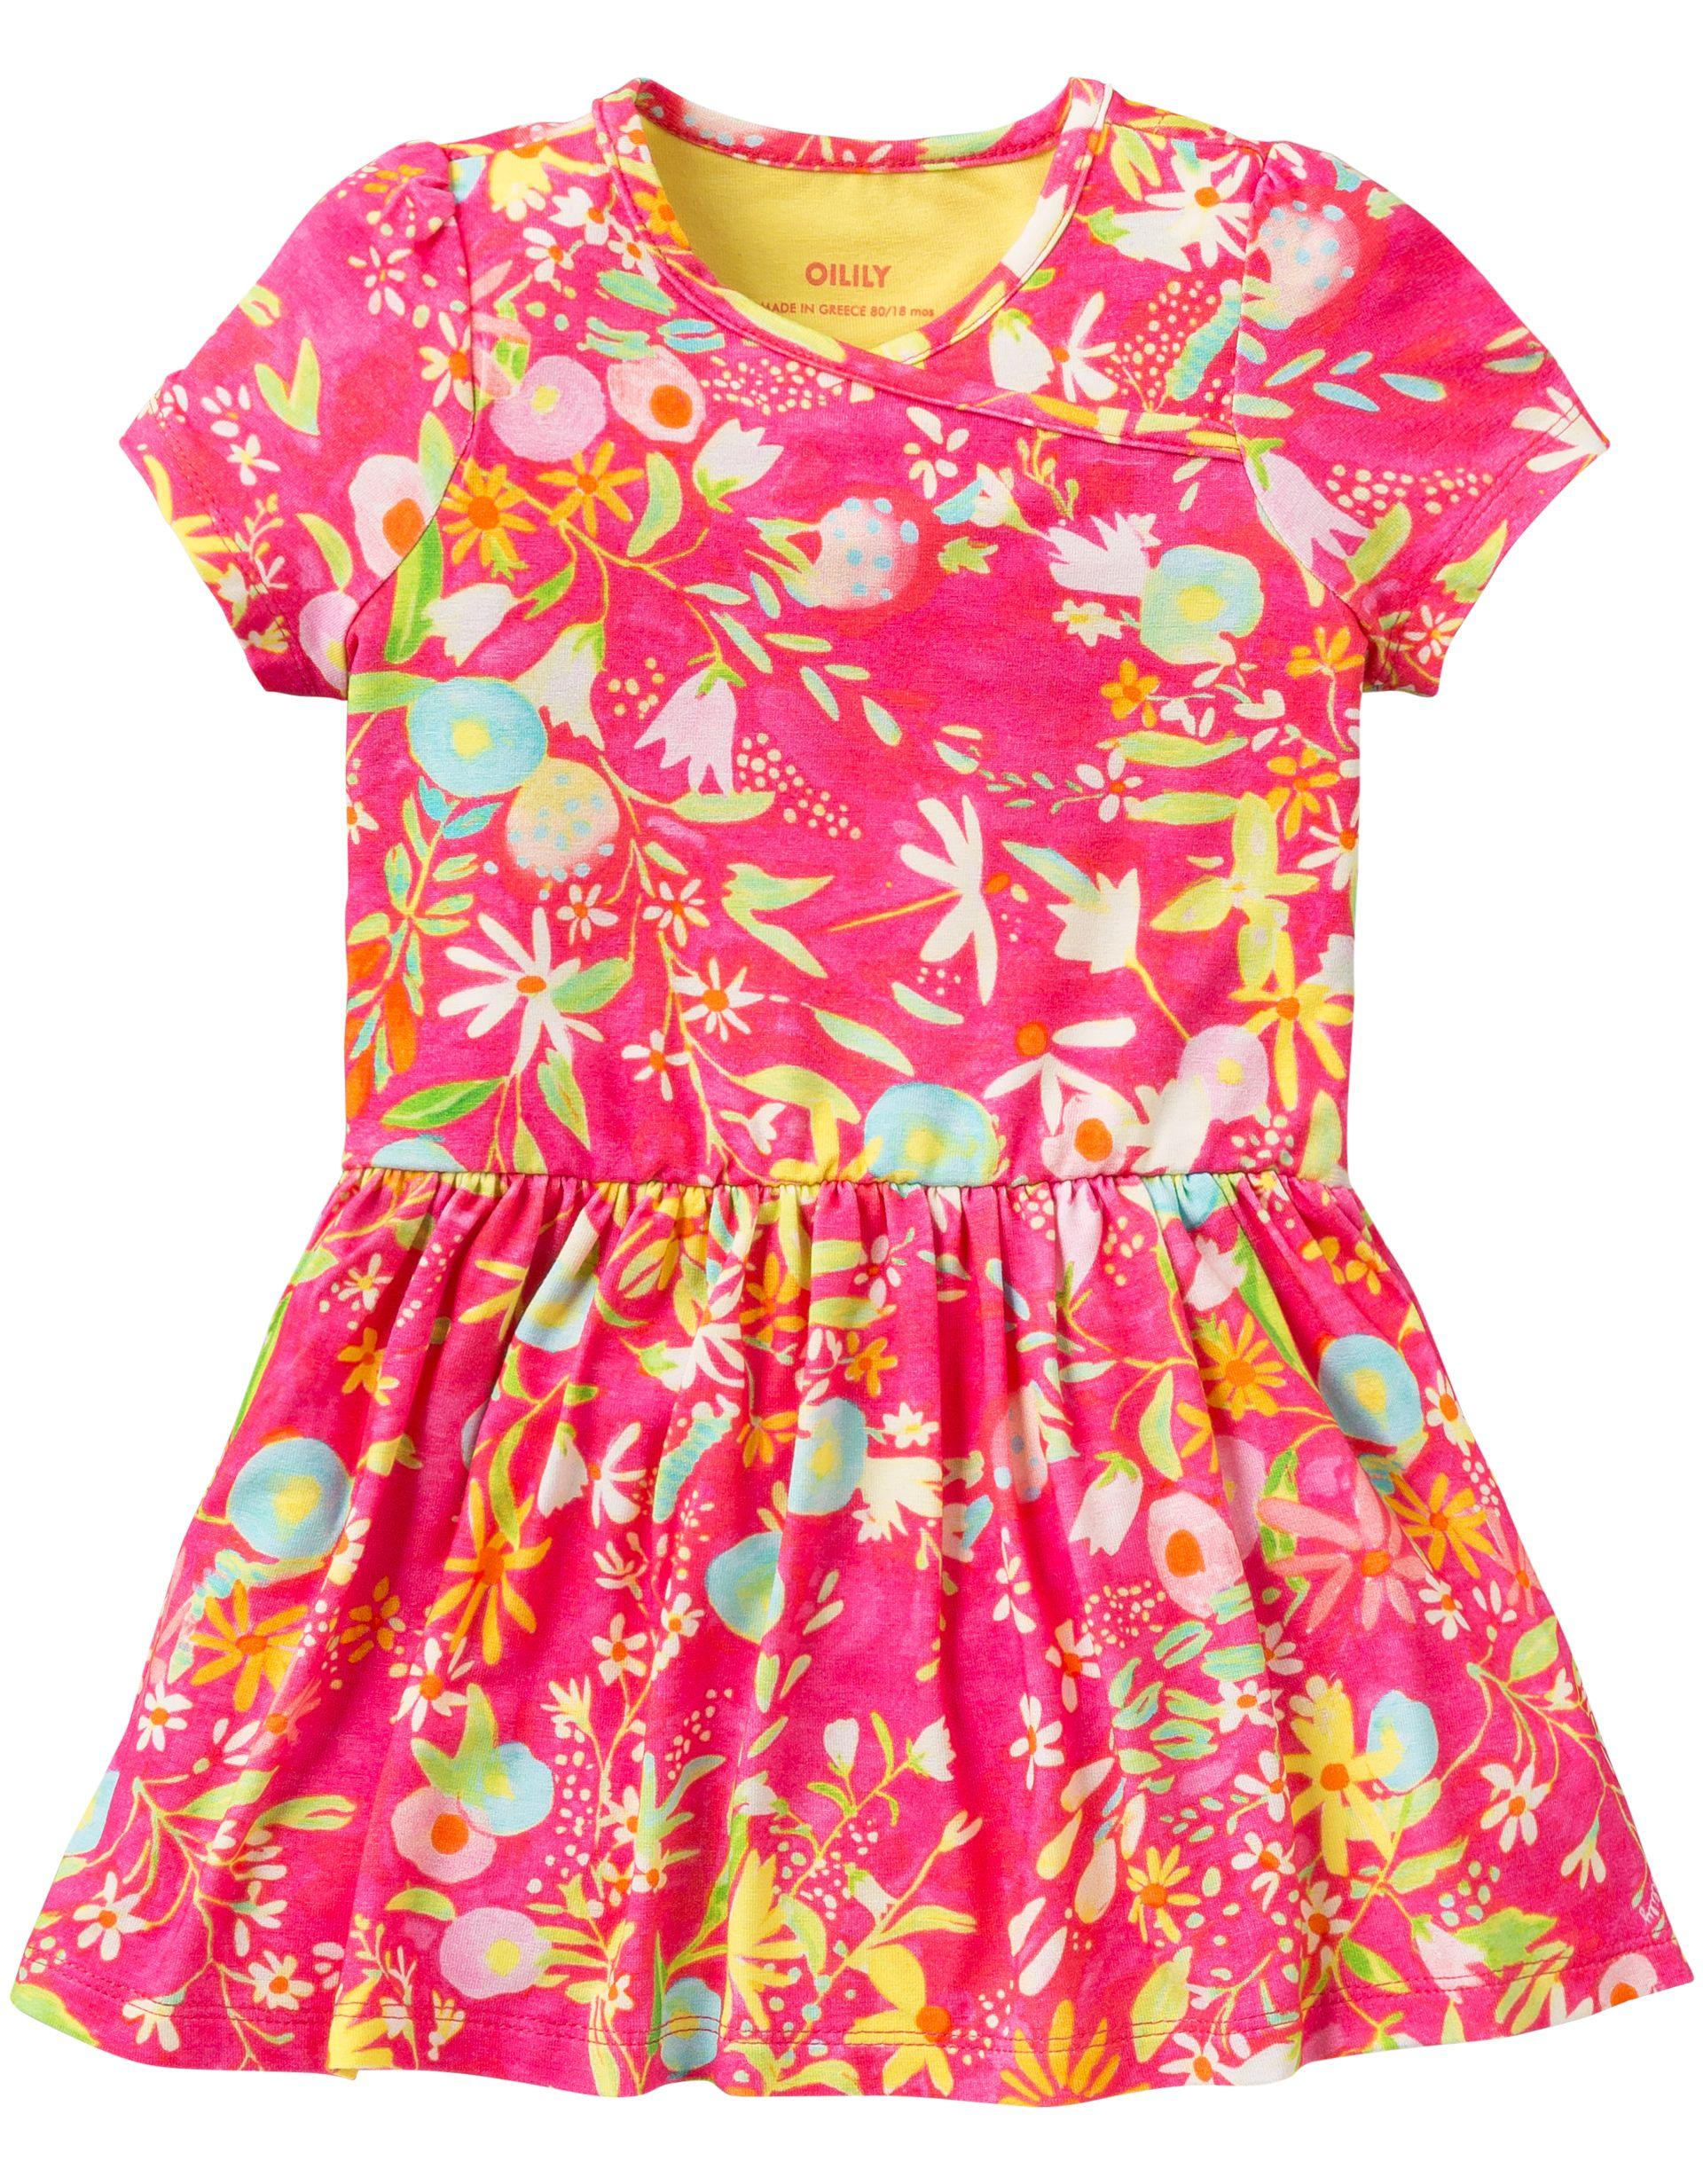 H&m pink pleated dress  OILILY Childrenus Wear  Spring Summer   Dress Trisha  Little